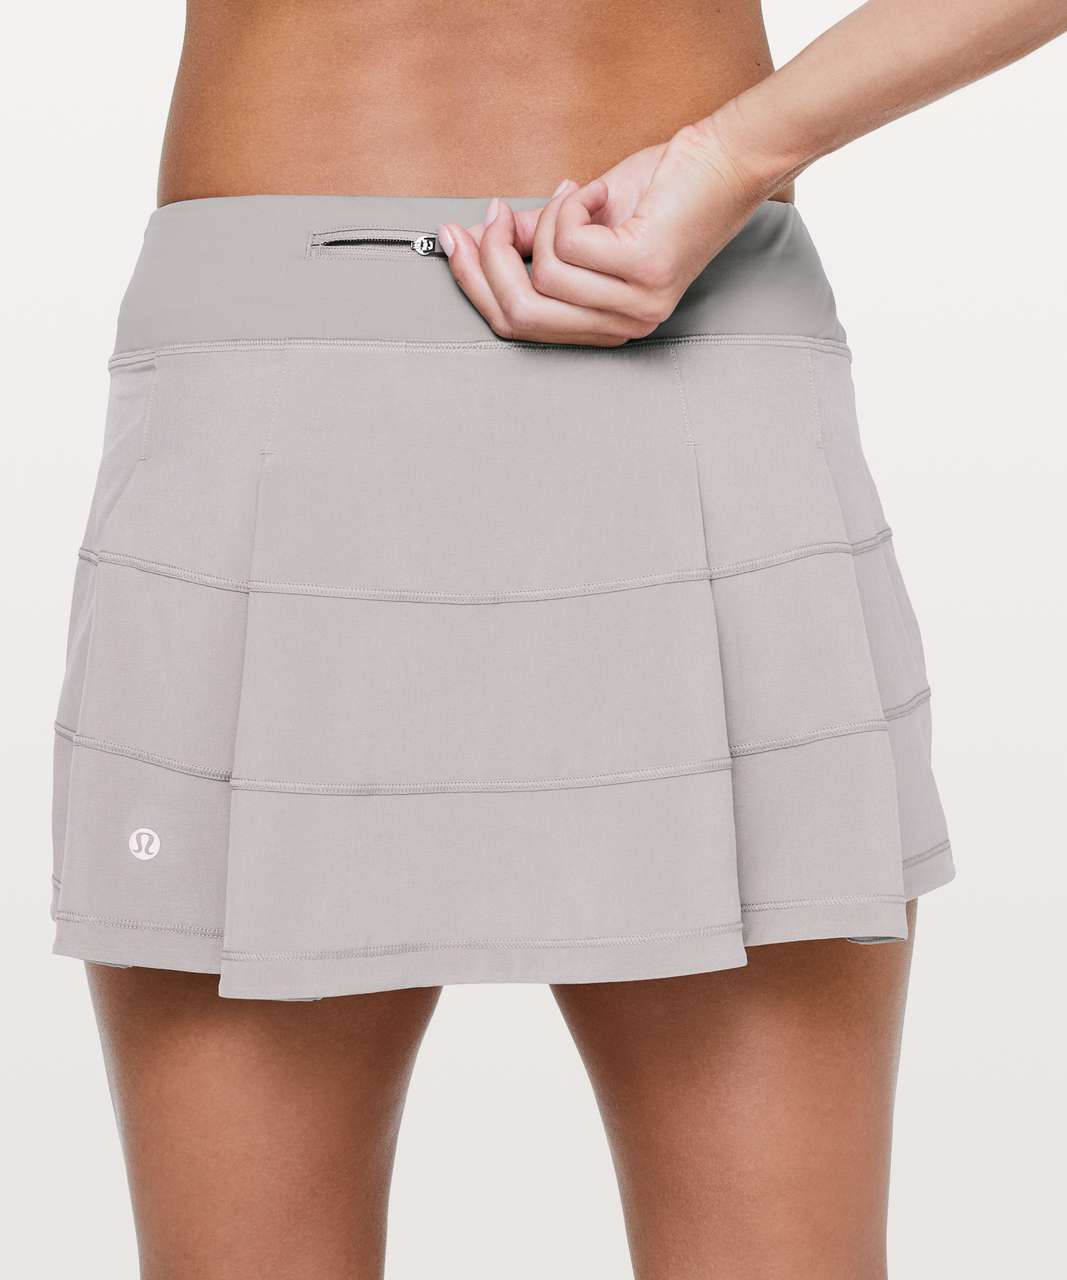 "Lululemon Pace Rival Skirt (Regular) *4-way Stretch 13"" - Dark Chrome"